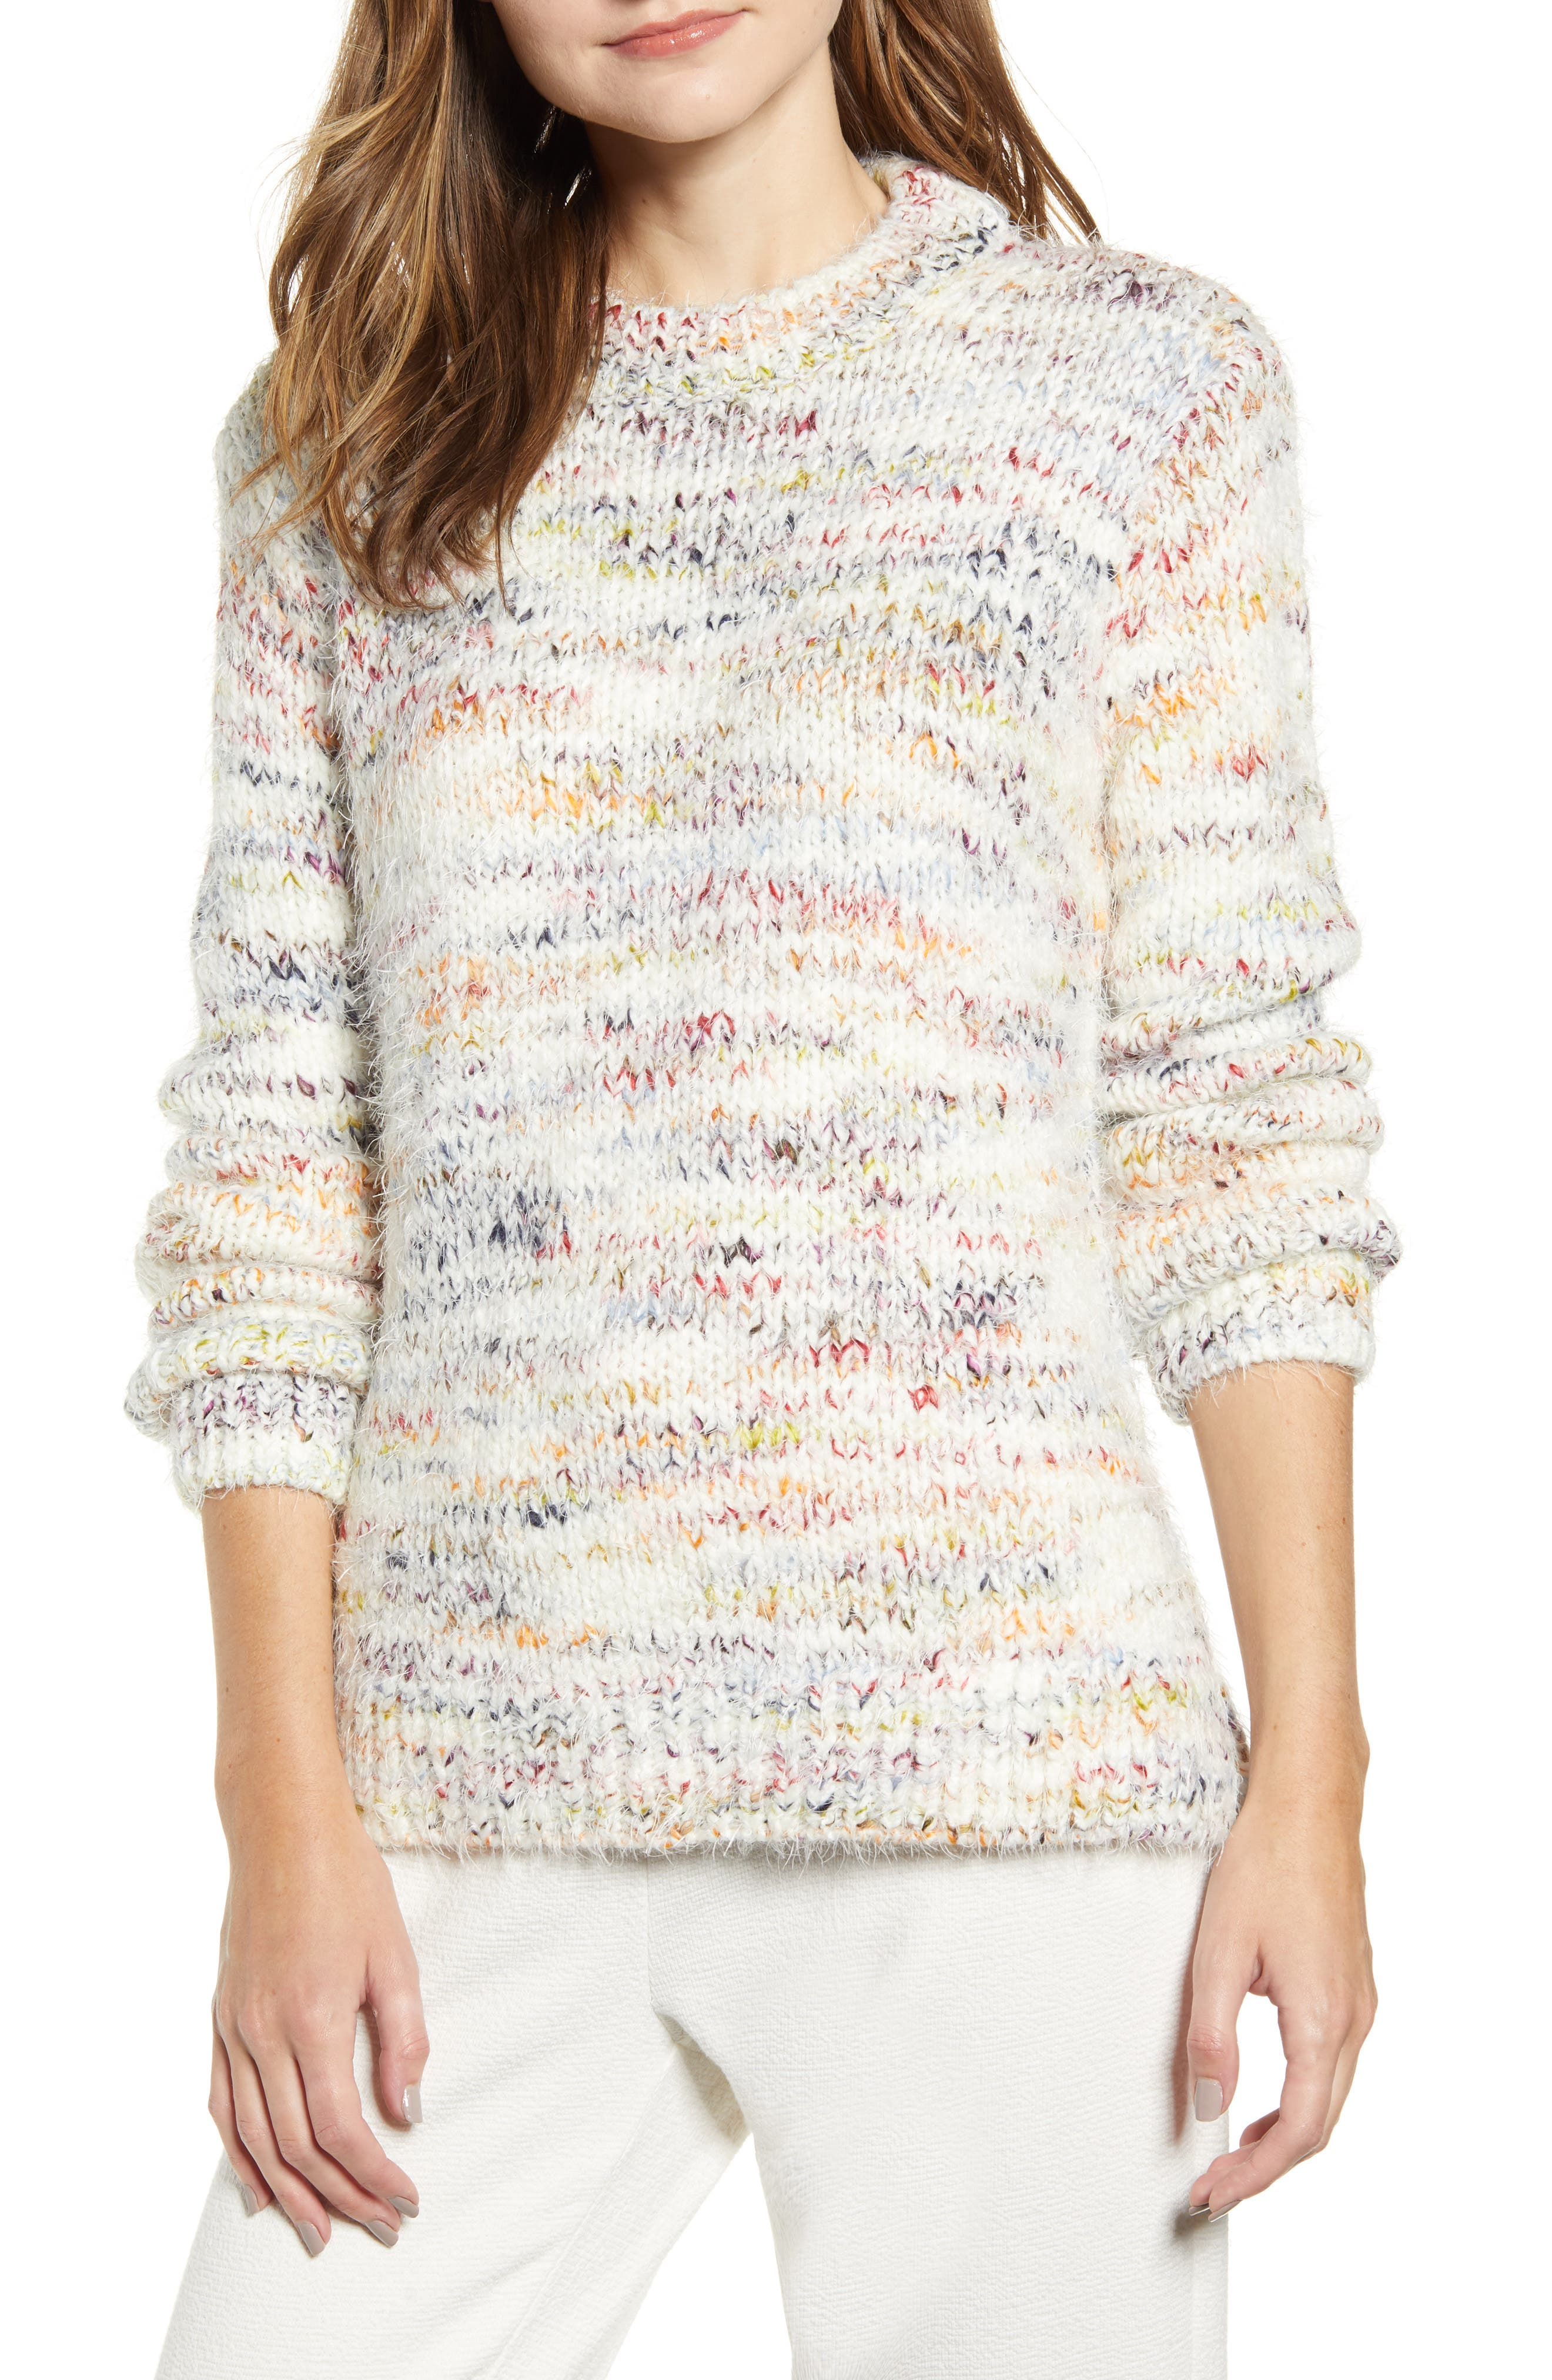 Lou & Grey Confetti Tunic Sweater